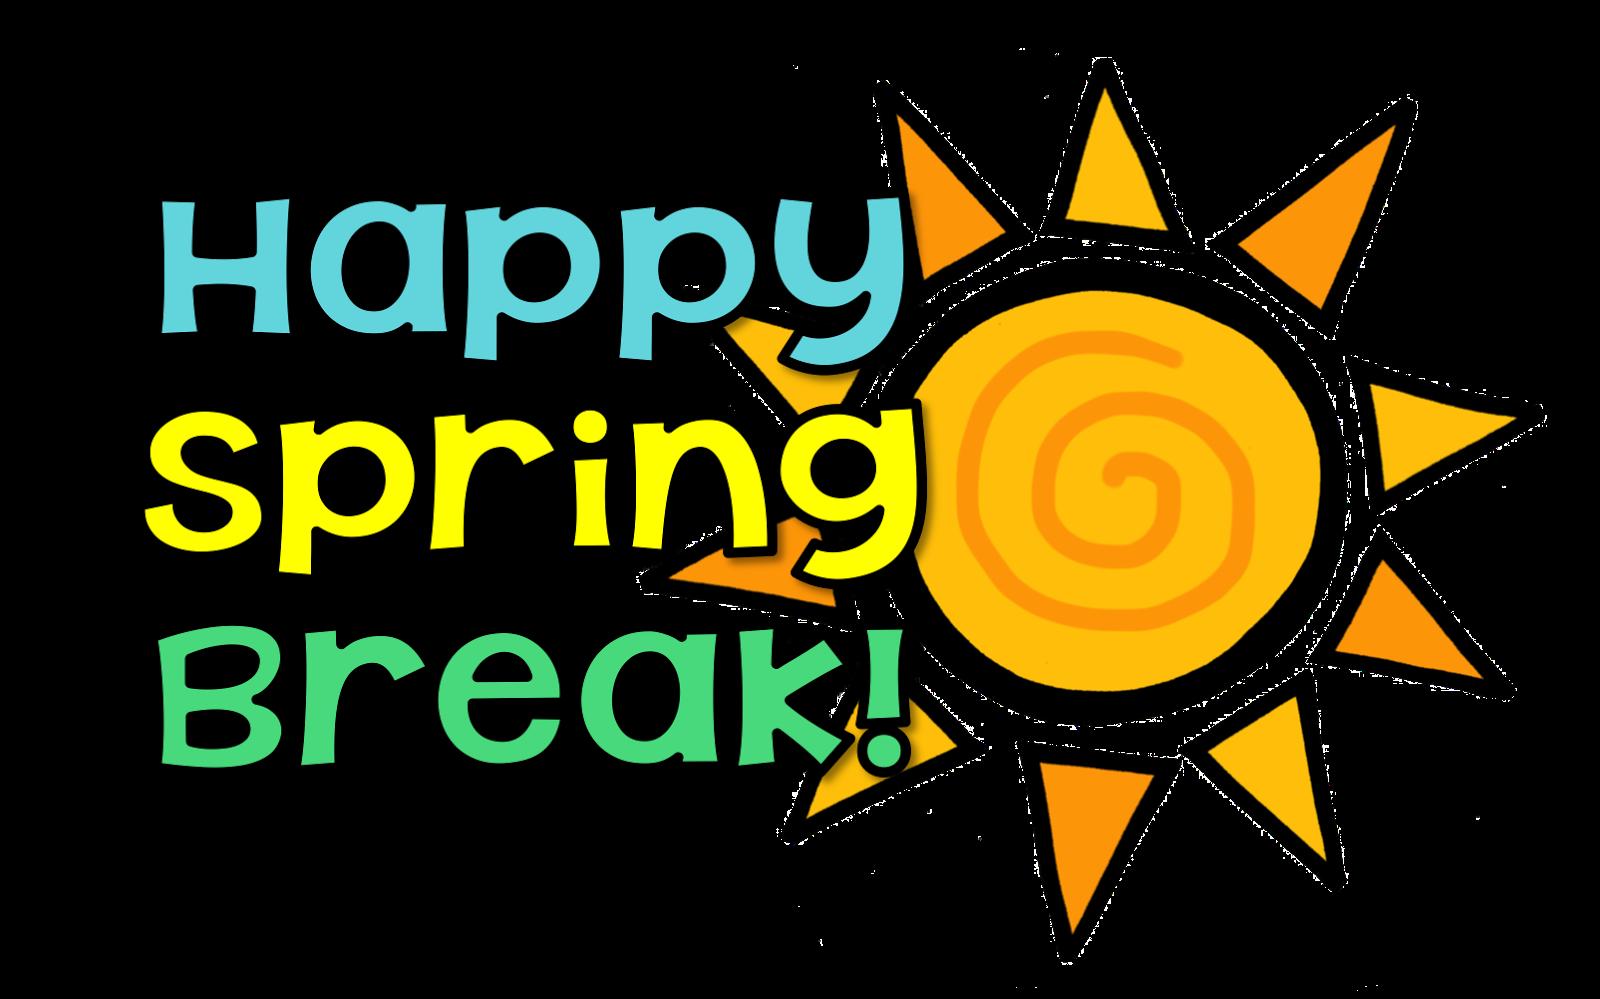 Win clipart spring. Free break cliparts download